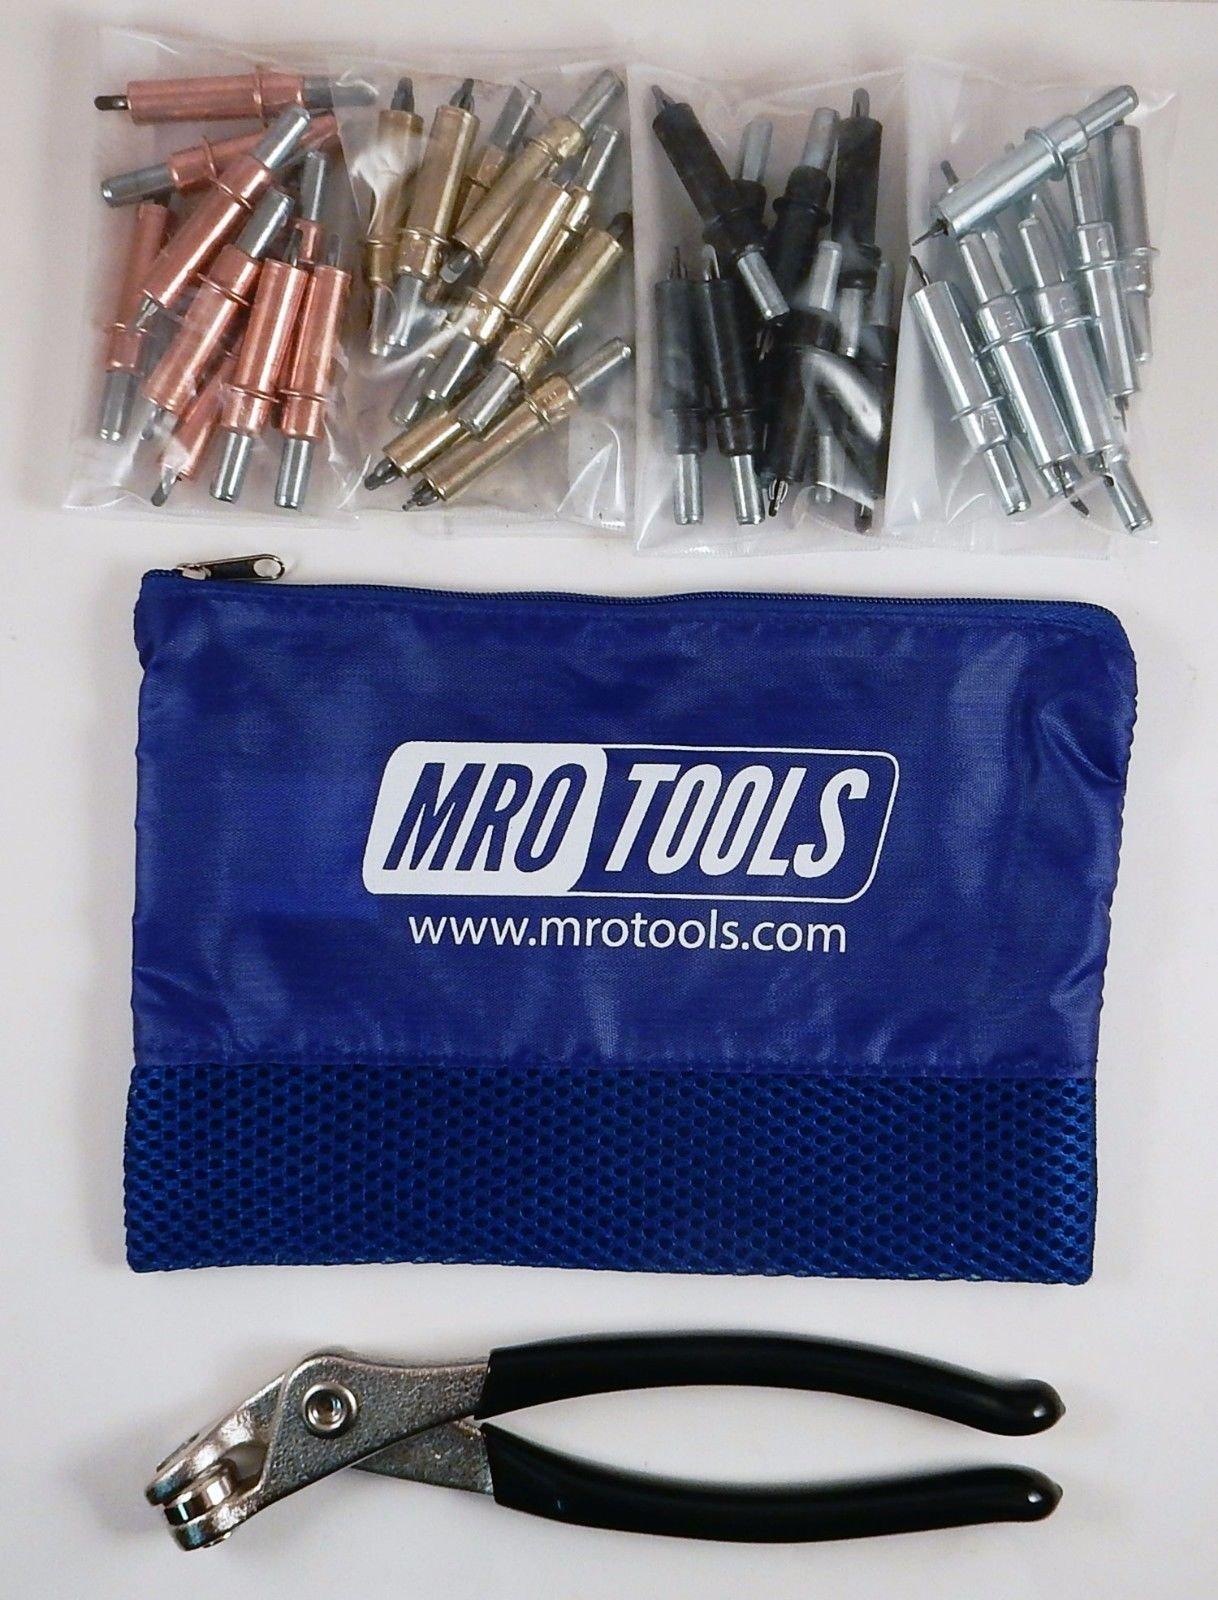 K-Series Beginner Cleco Sheet Metal Fastener Kit w/Mesh Carry Bag (K5S40)